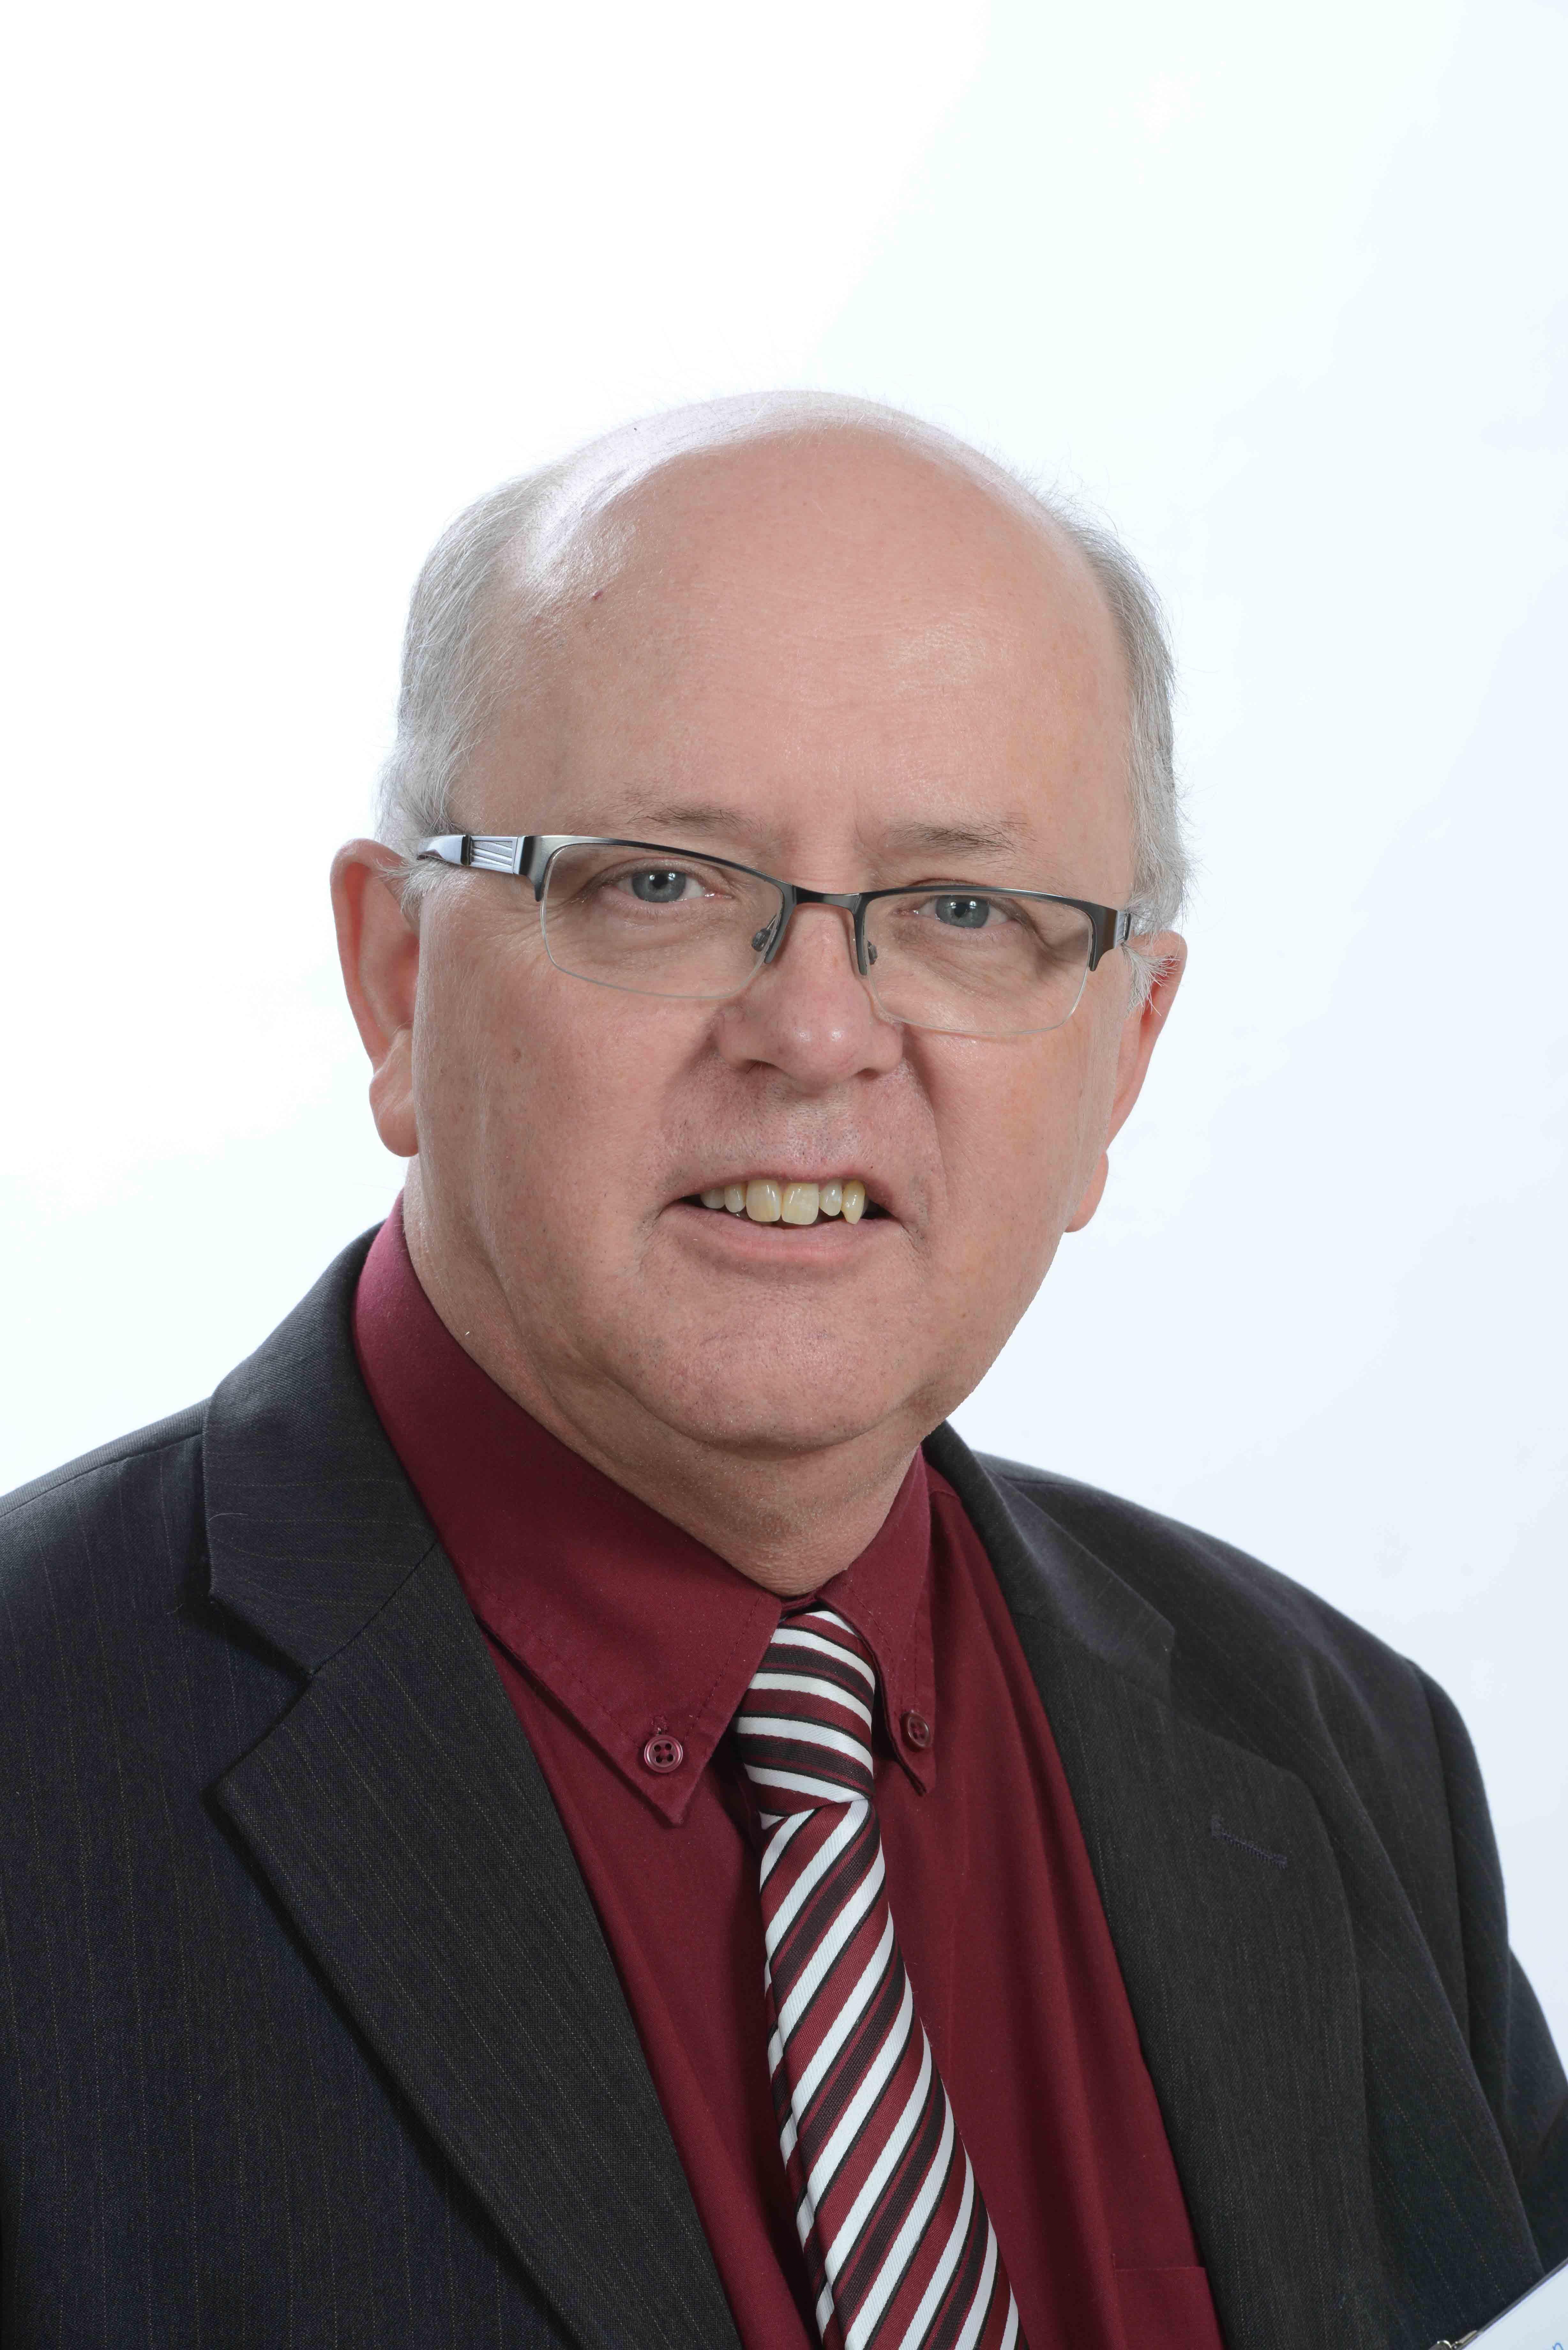 John Hodgkinson